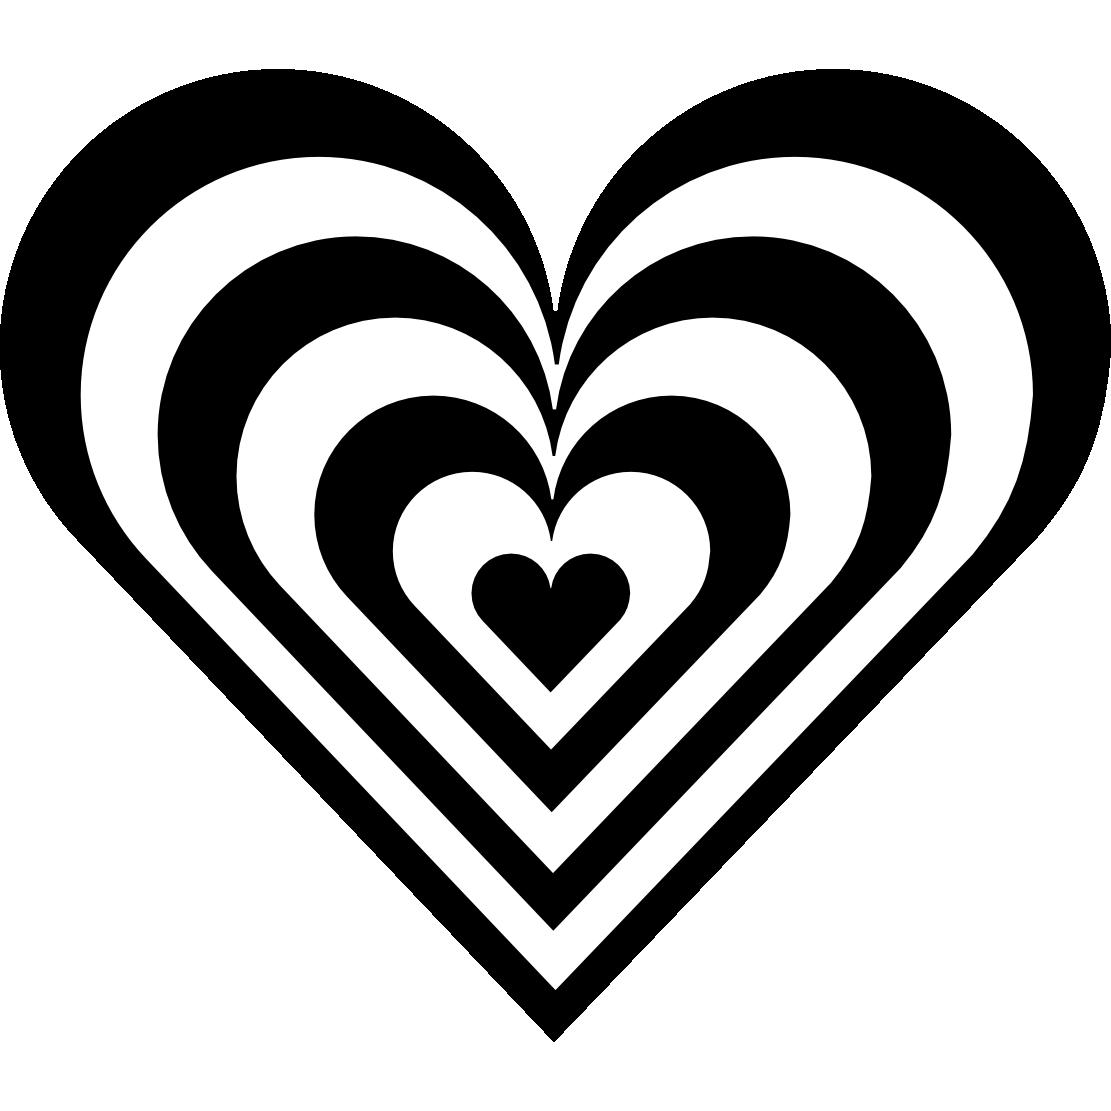 White clipart love heart Clipart Free Black Heart Clipart